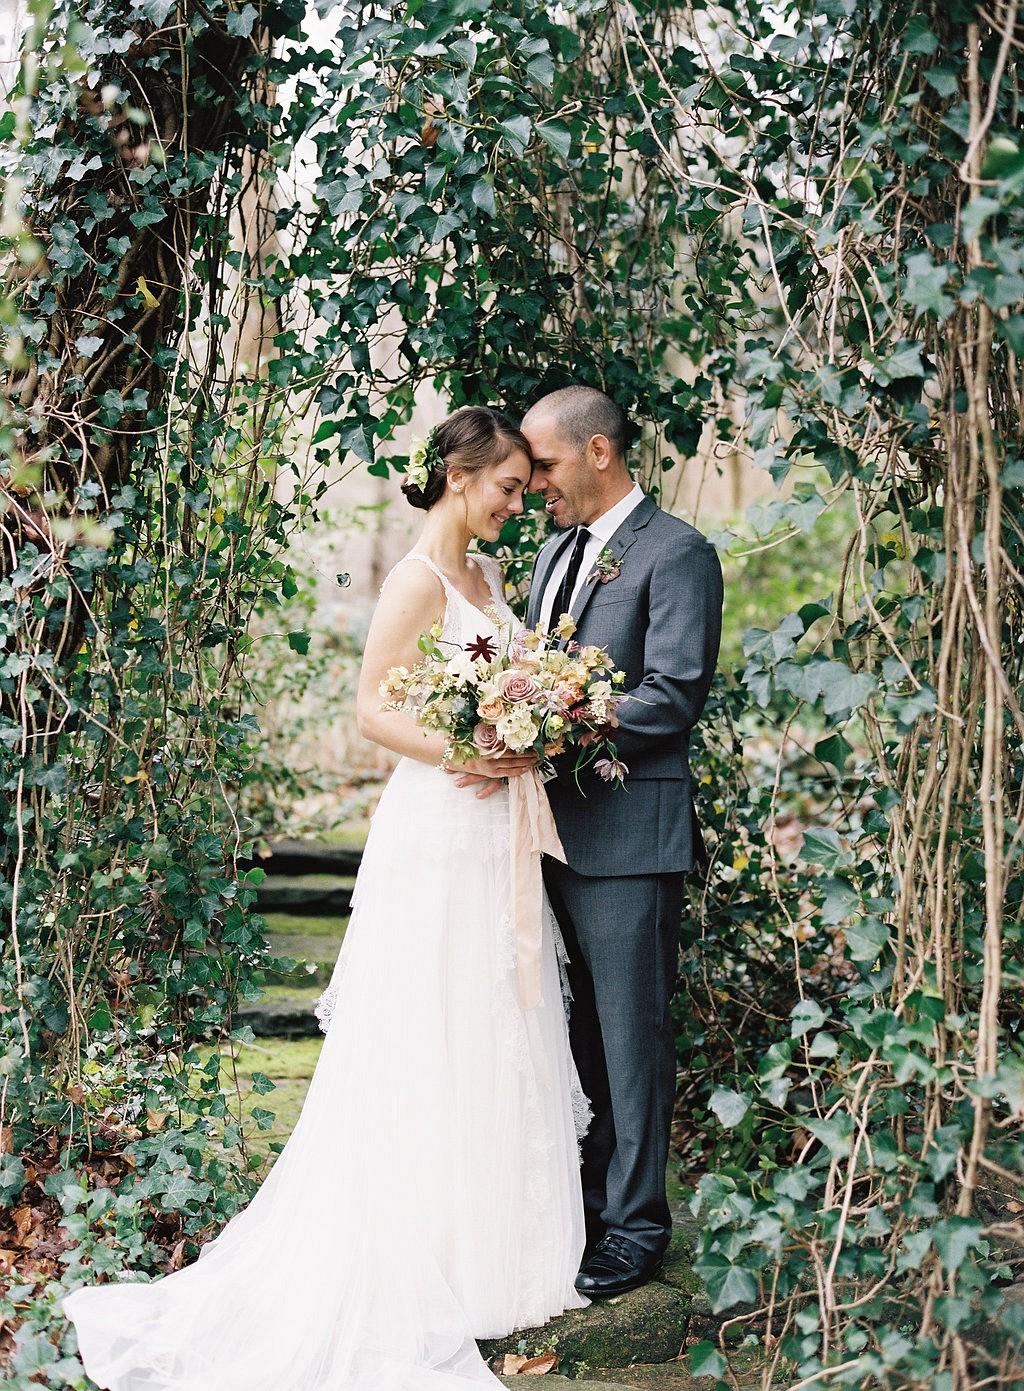 Hannah and Matt's Intimate Garden Wedding at Serenbe